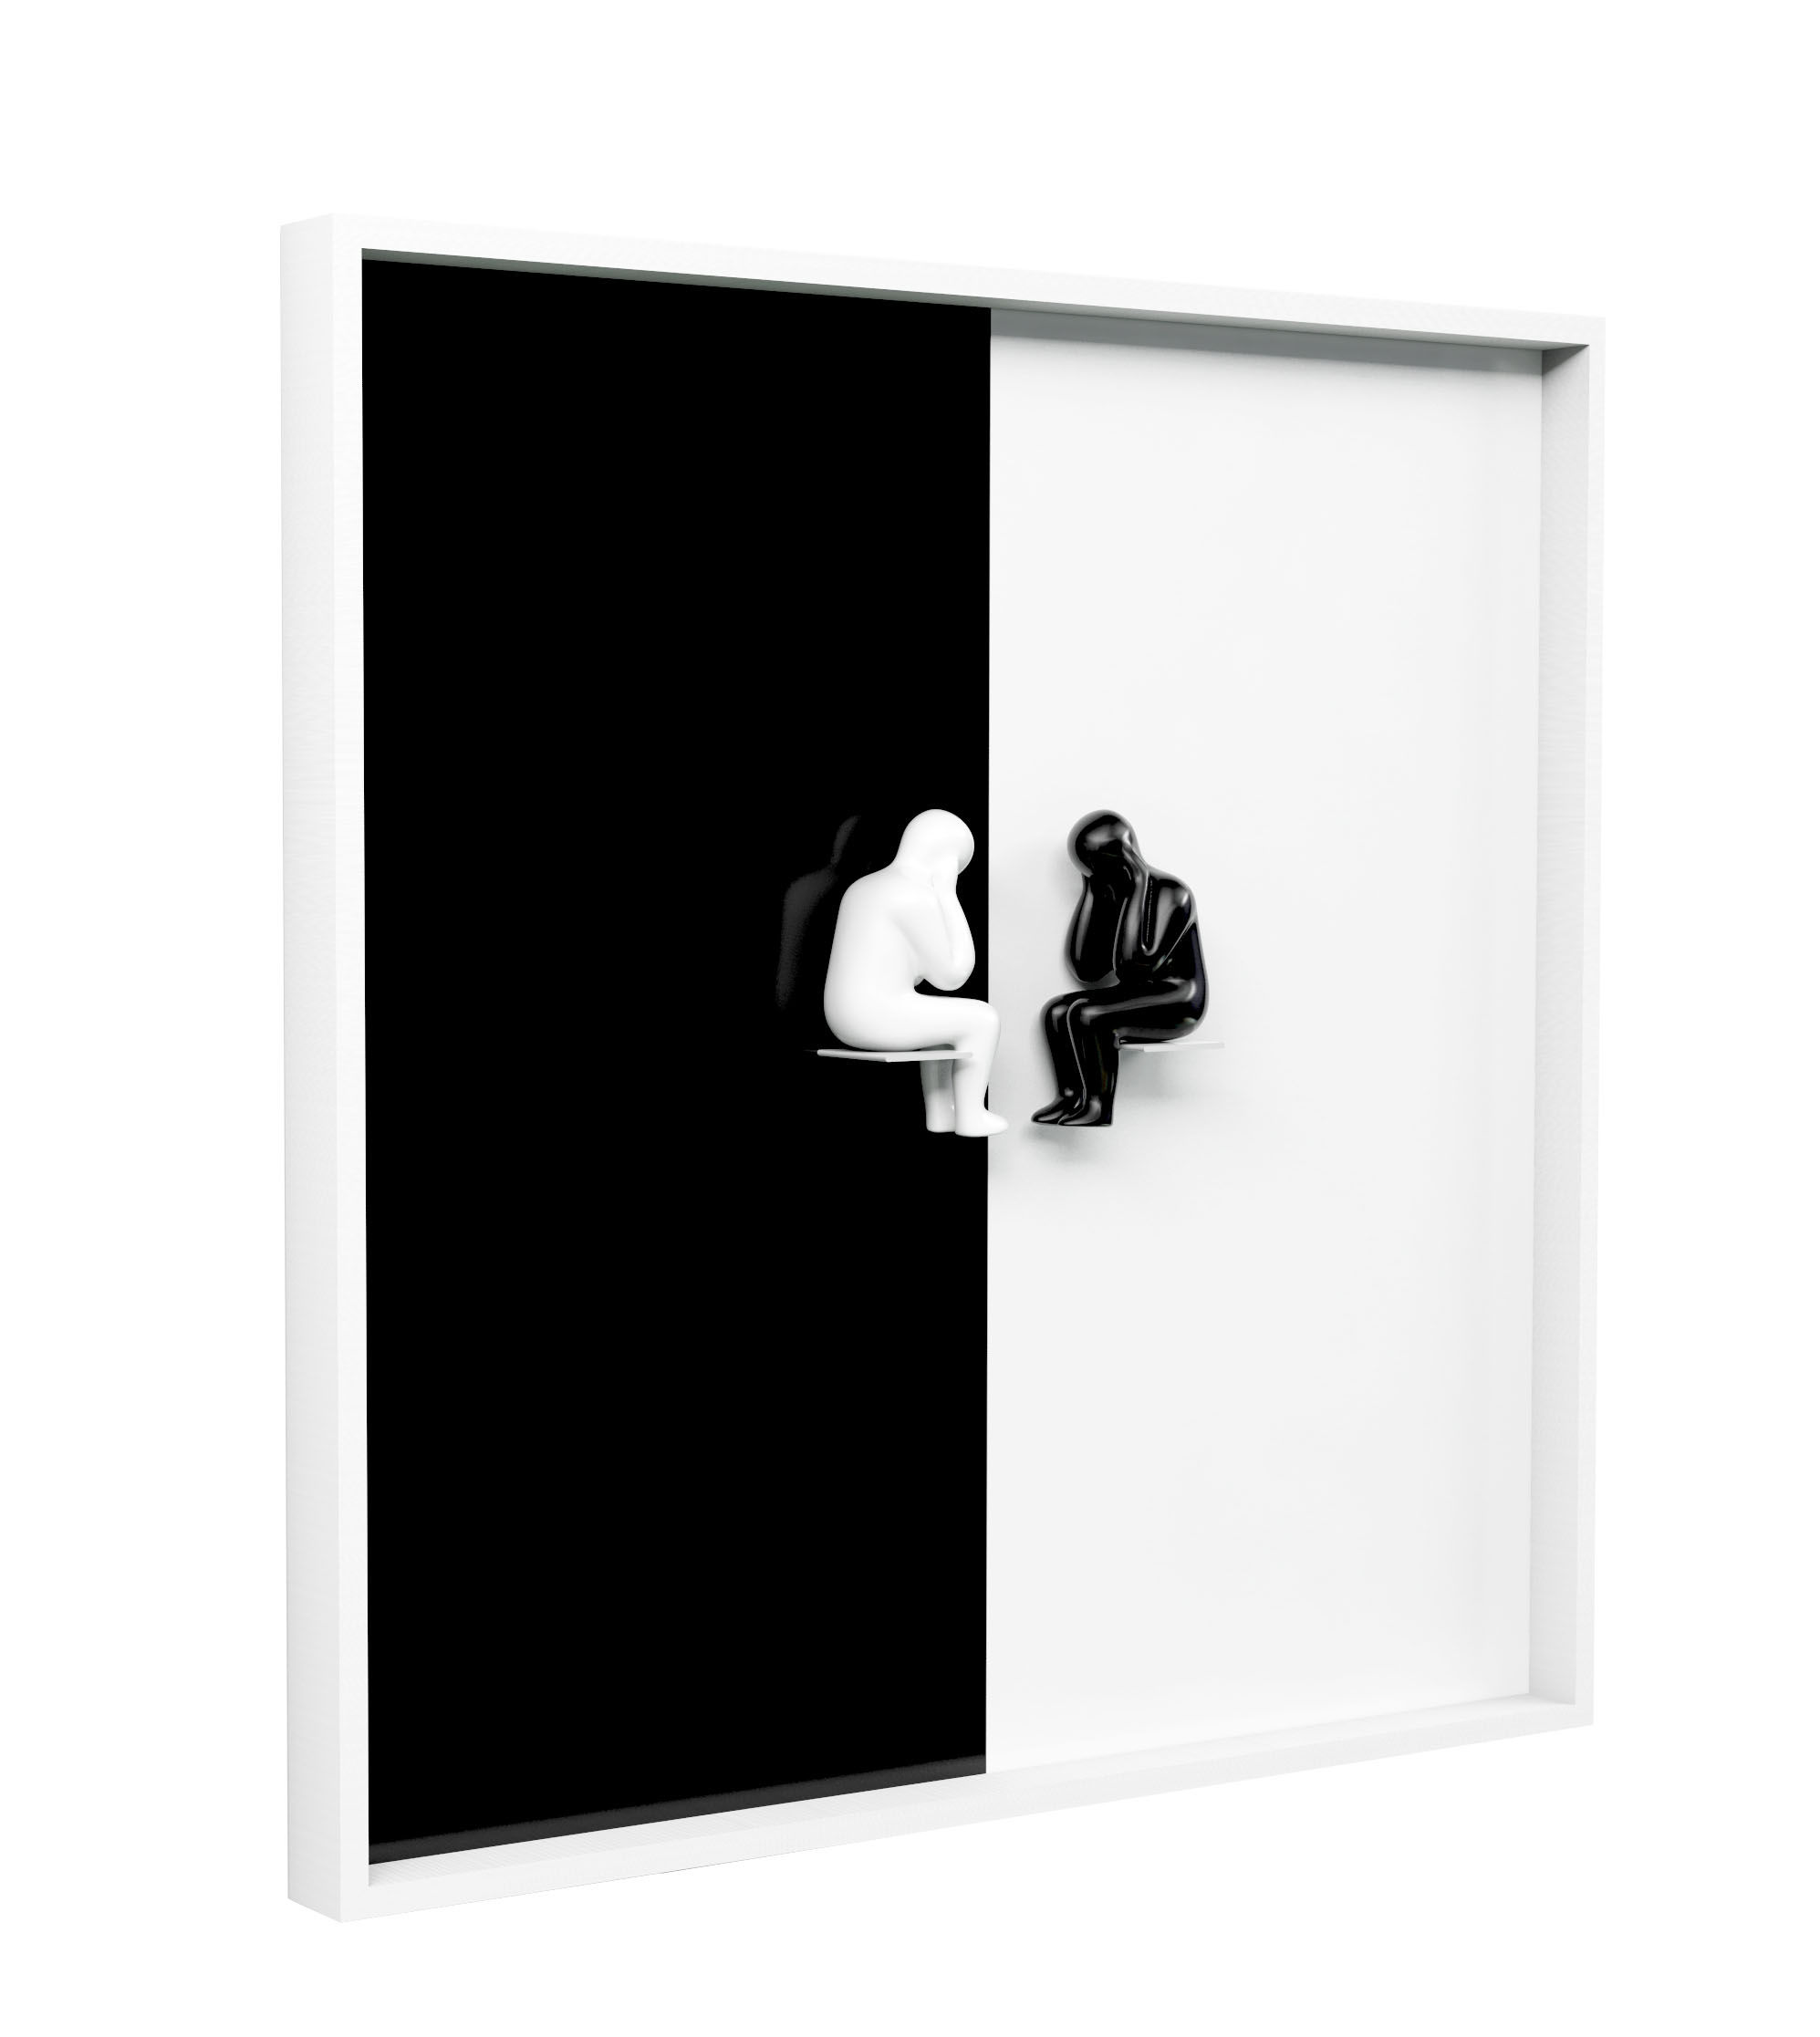 maurizio-balducci-artista-lp-bianco-nero